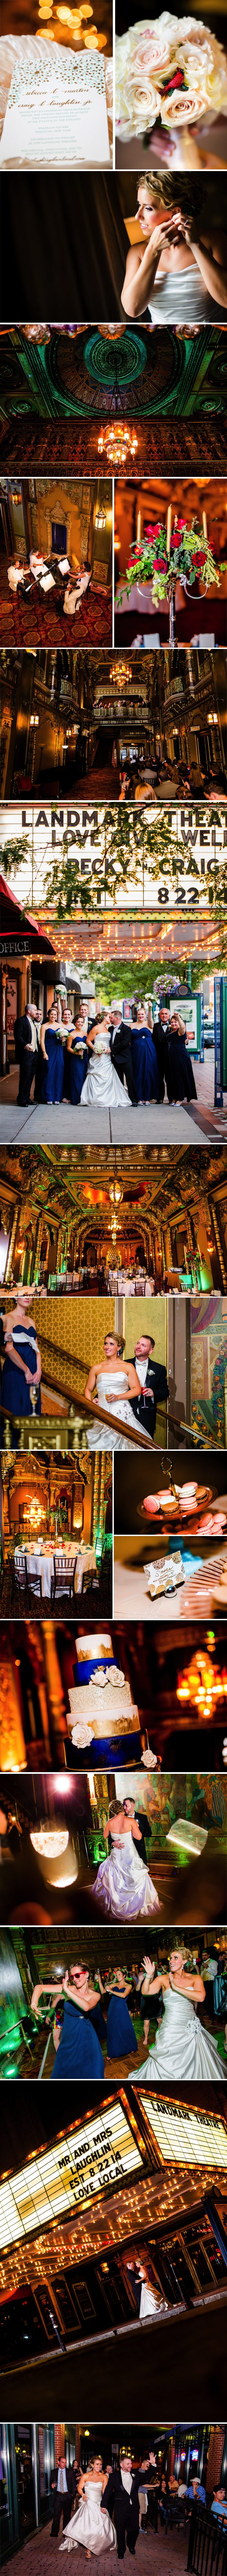 Lovewell wedding in Syracuse, New York